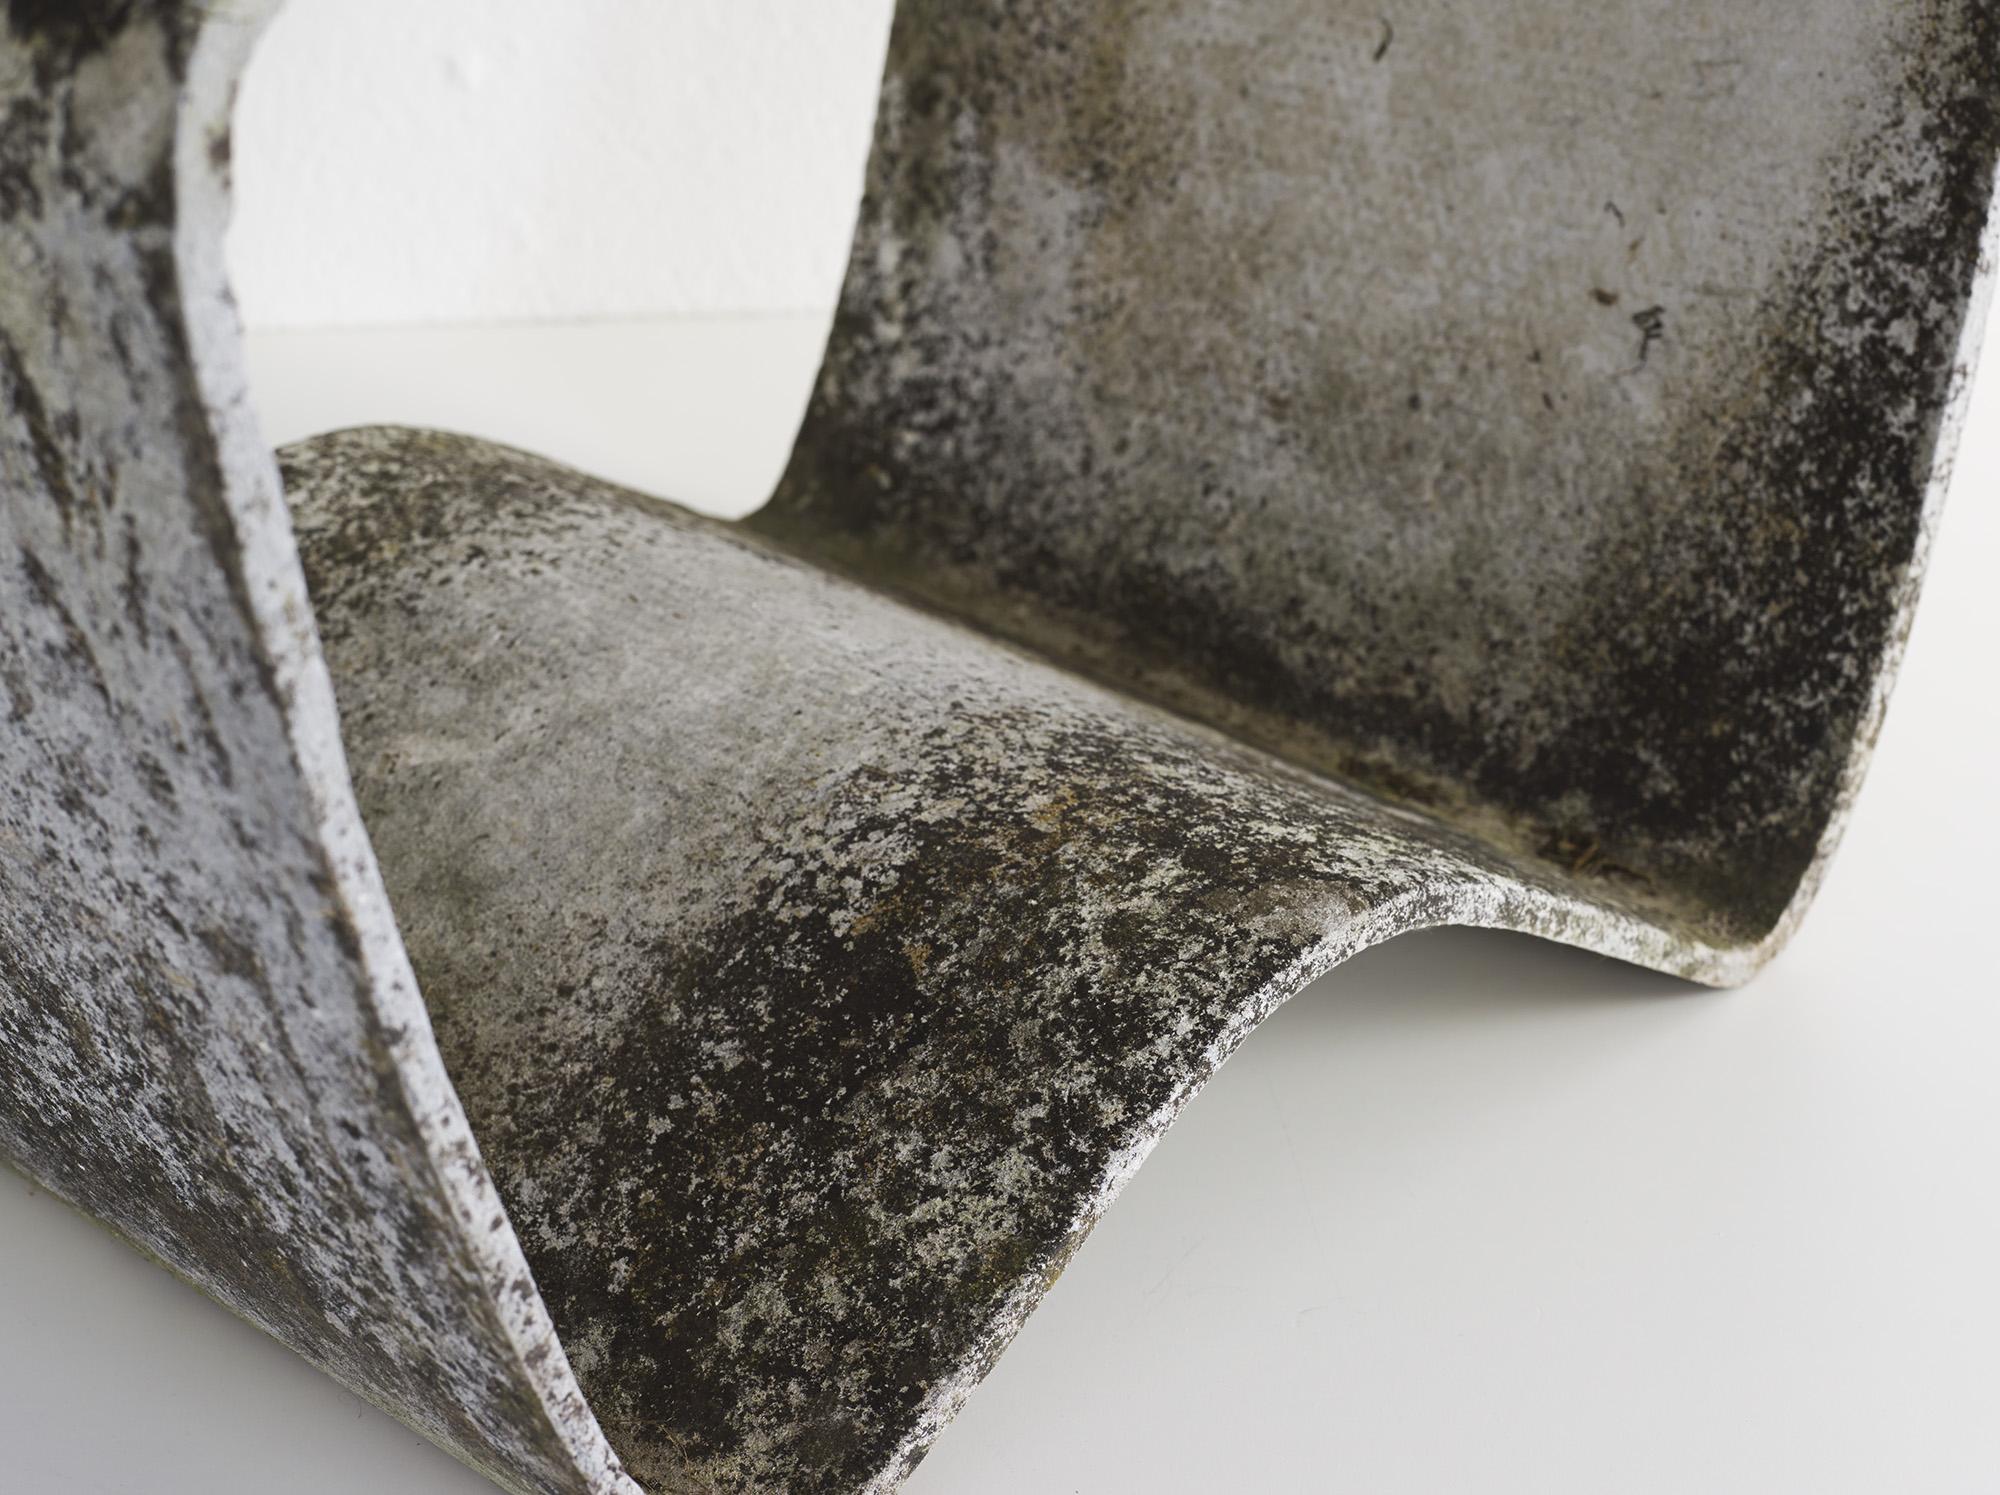 rare-stool-g59-11-by-ludwig-walser-image-02